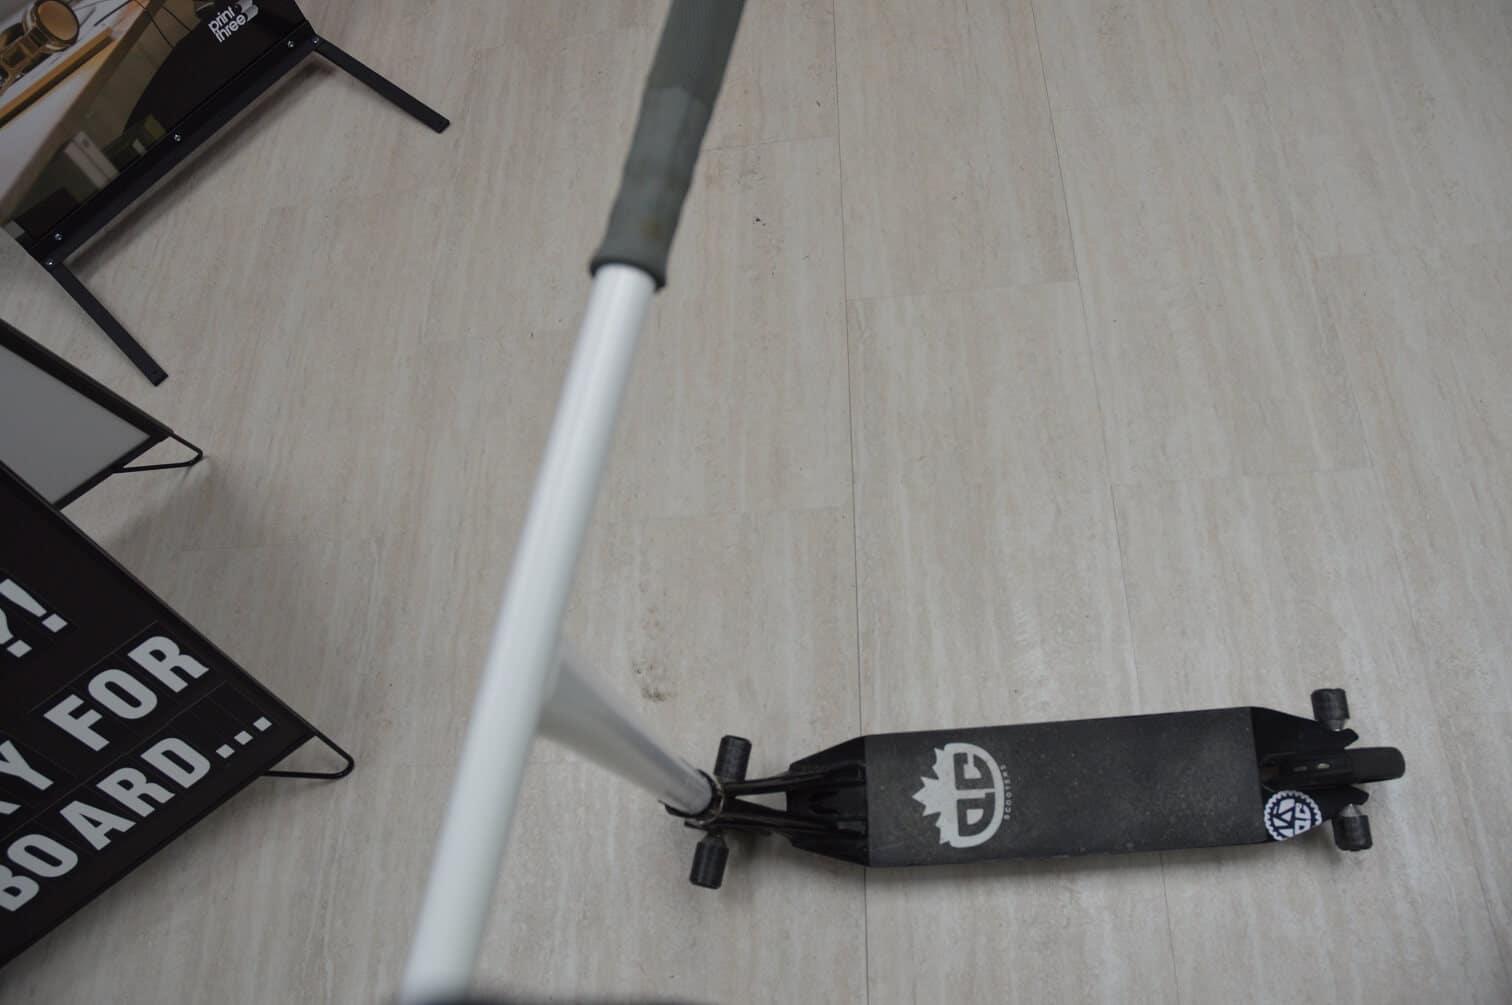 Scooter Wrap Toronto